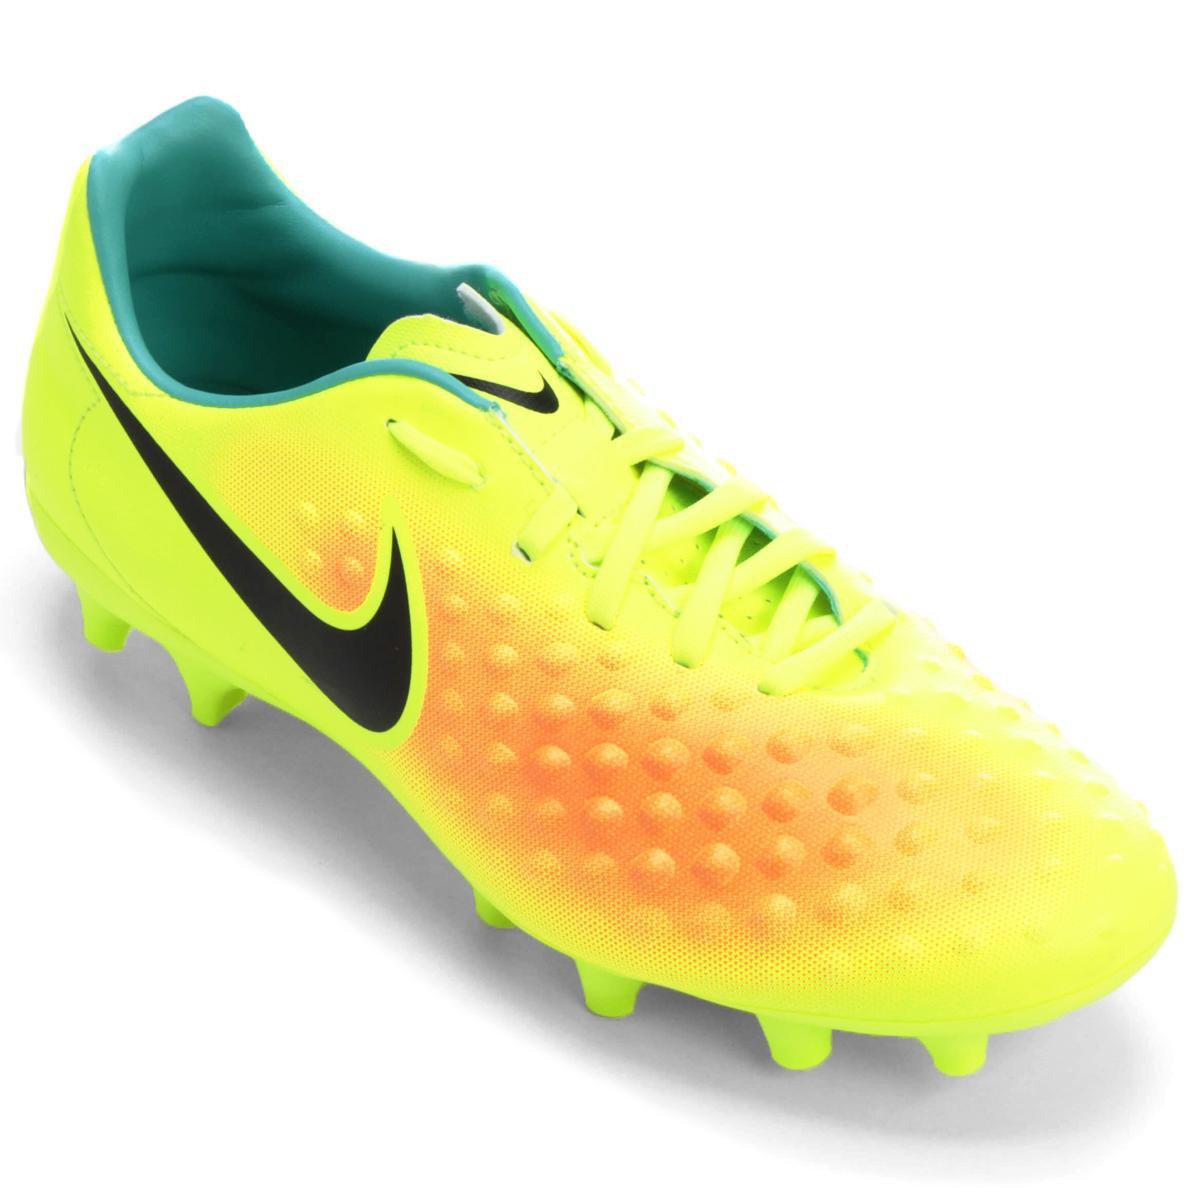 47ab74dd96 Chuteira Campo Nike Magista Onda II FG Masculina - Compre Agora ...